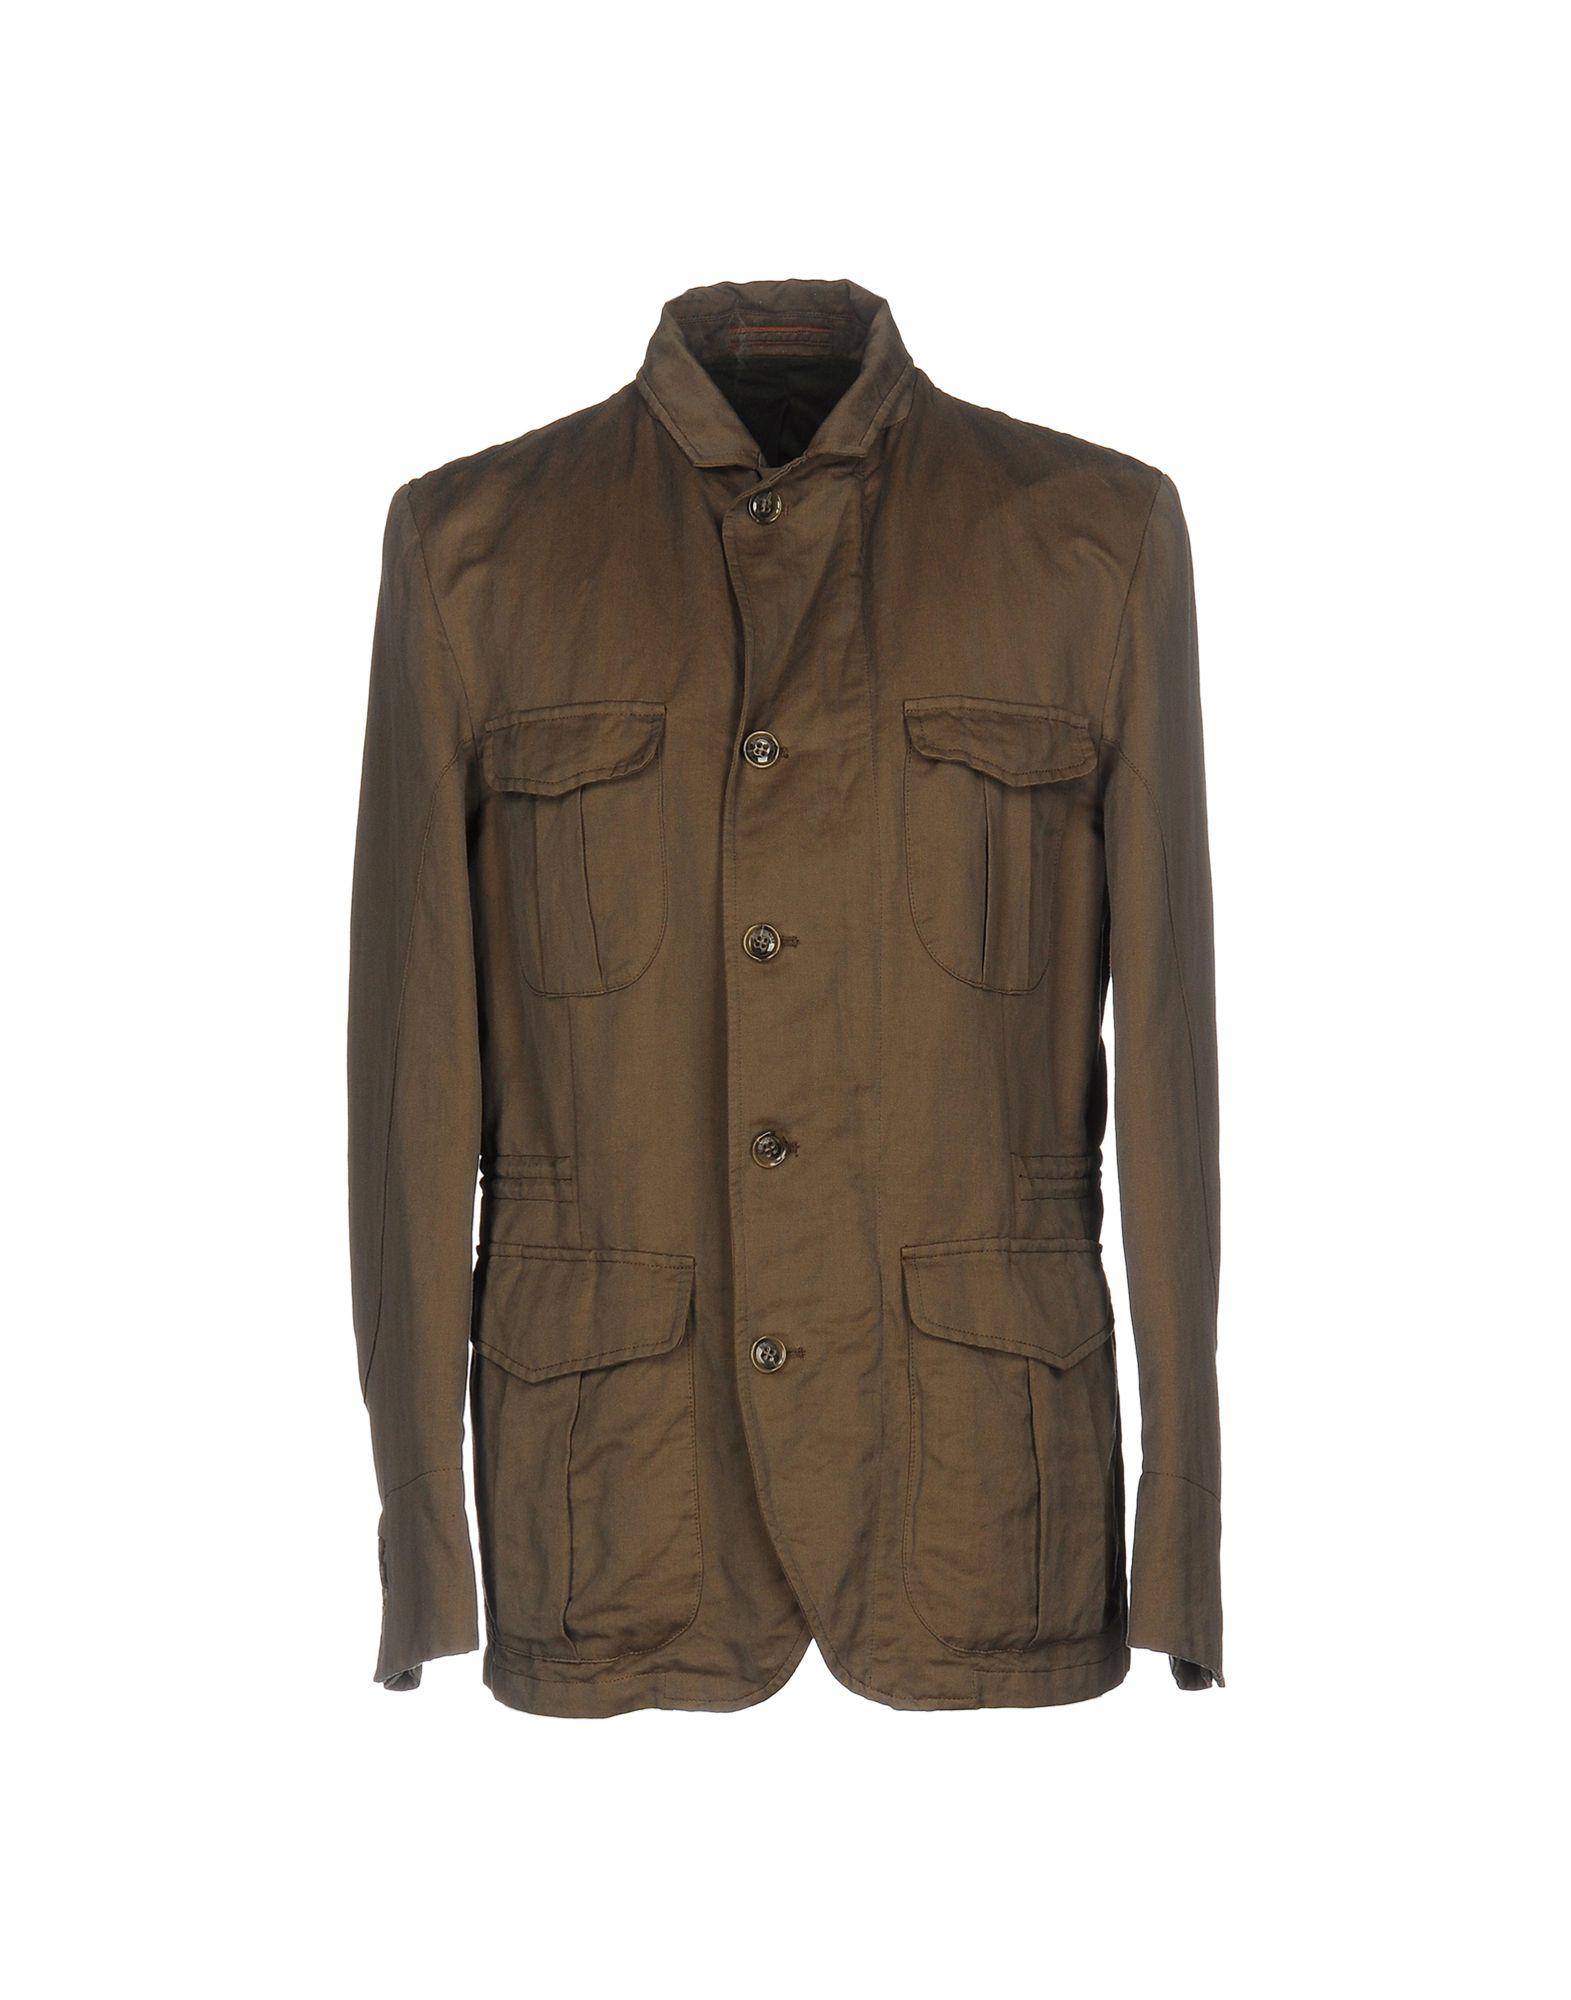 MONTEDORO Jacket in Cocoa